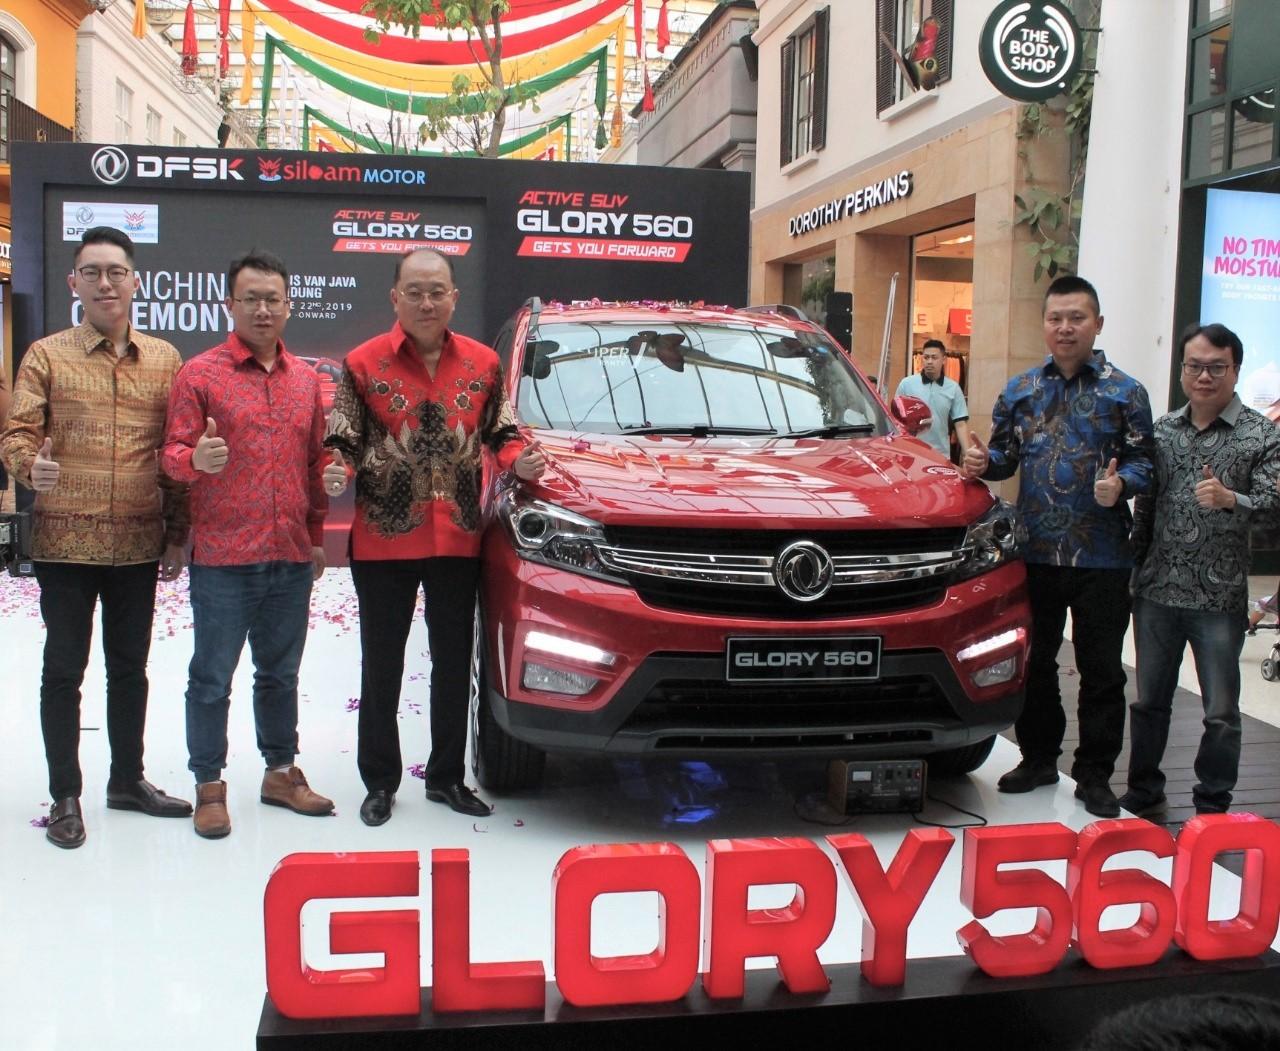 DFSK Glory 560 Idola Baru Warga Bandung